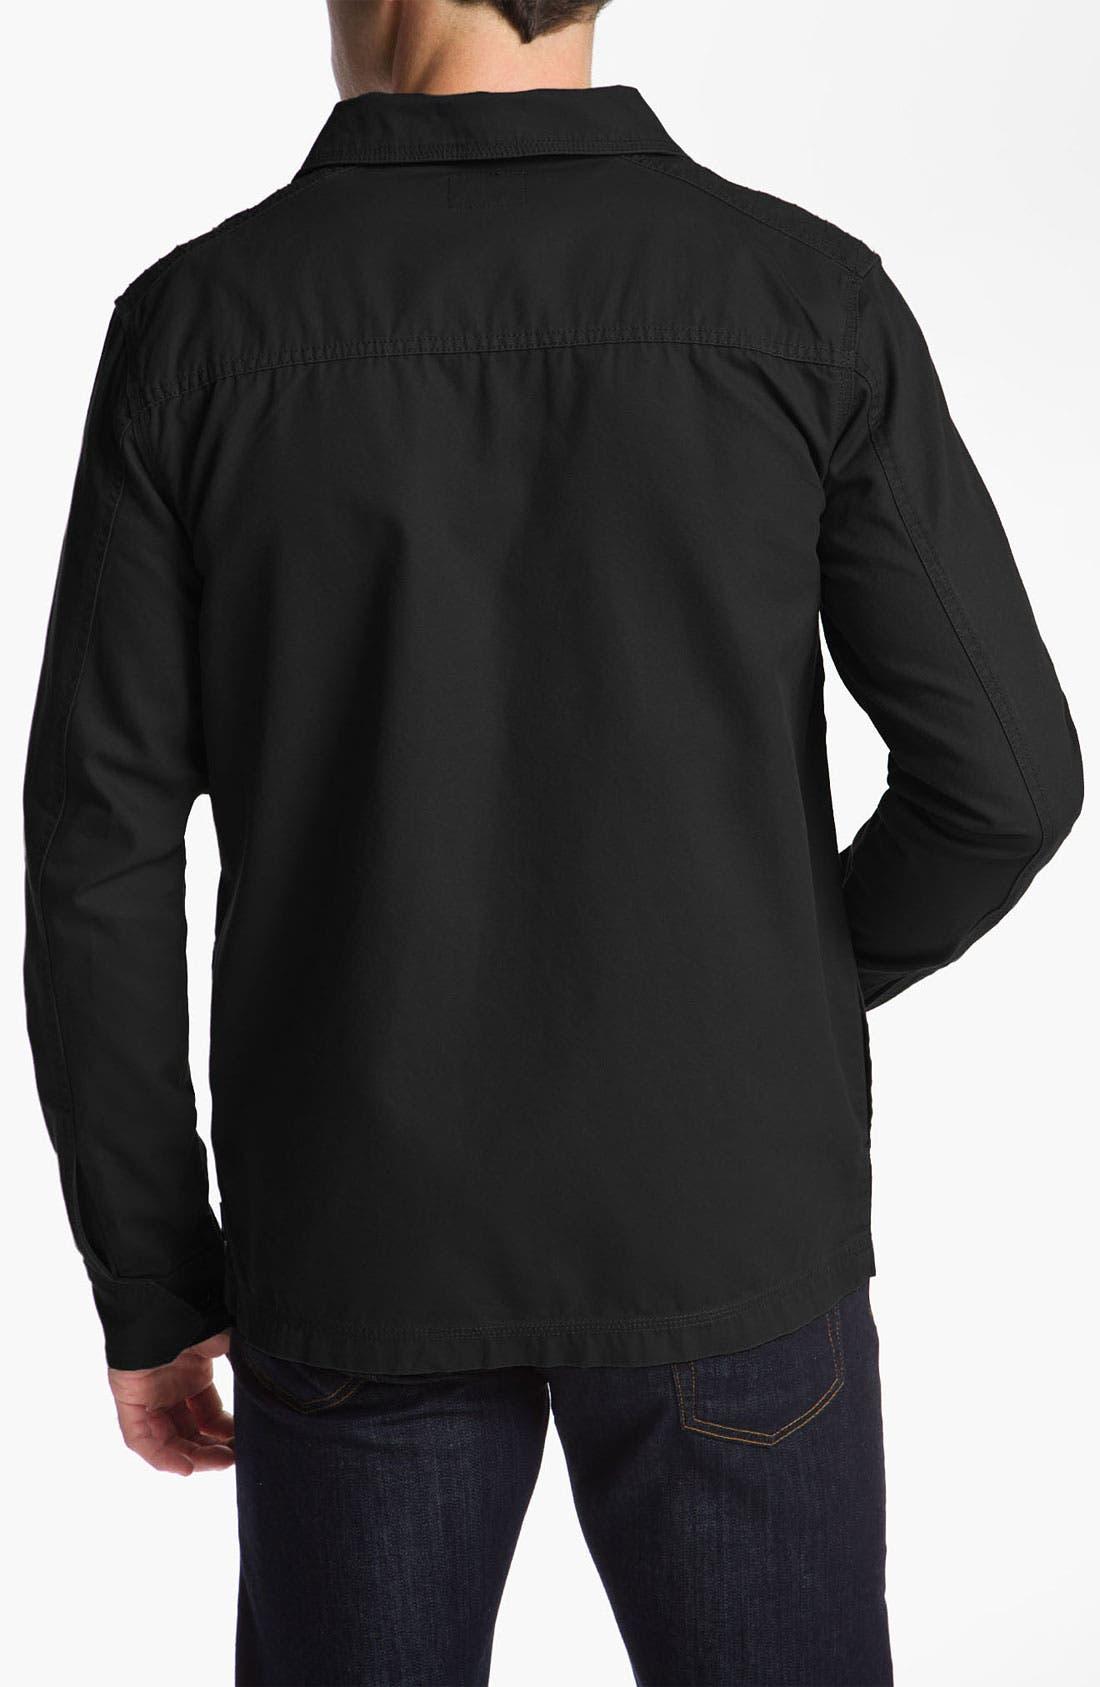 Alternate Image 2  - Quiksilver 'Cover' Jacket